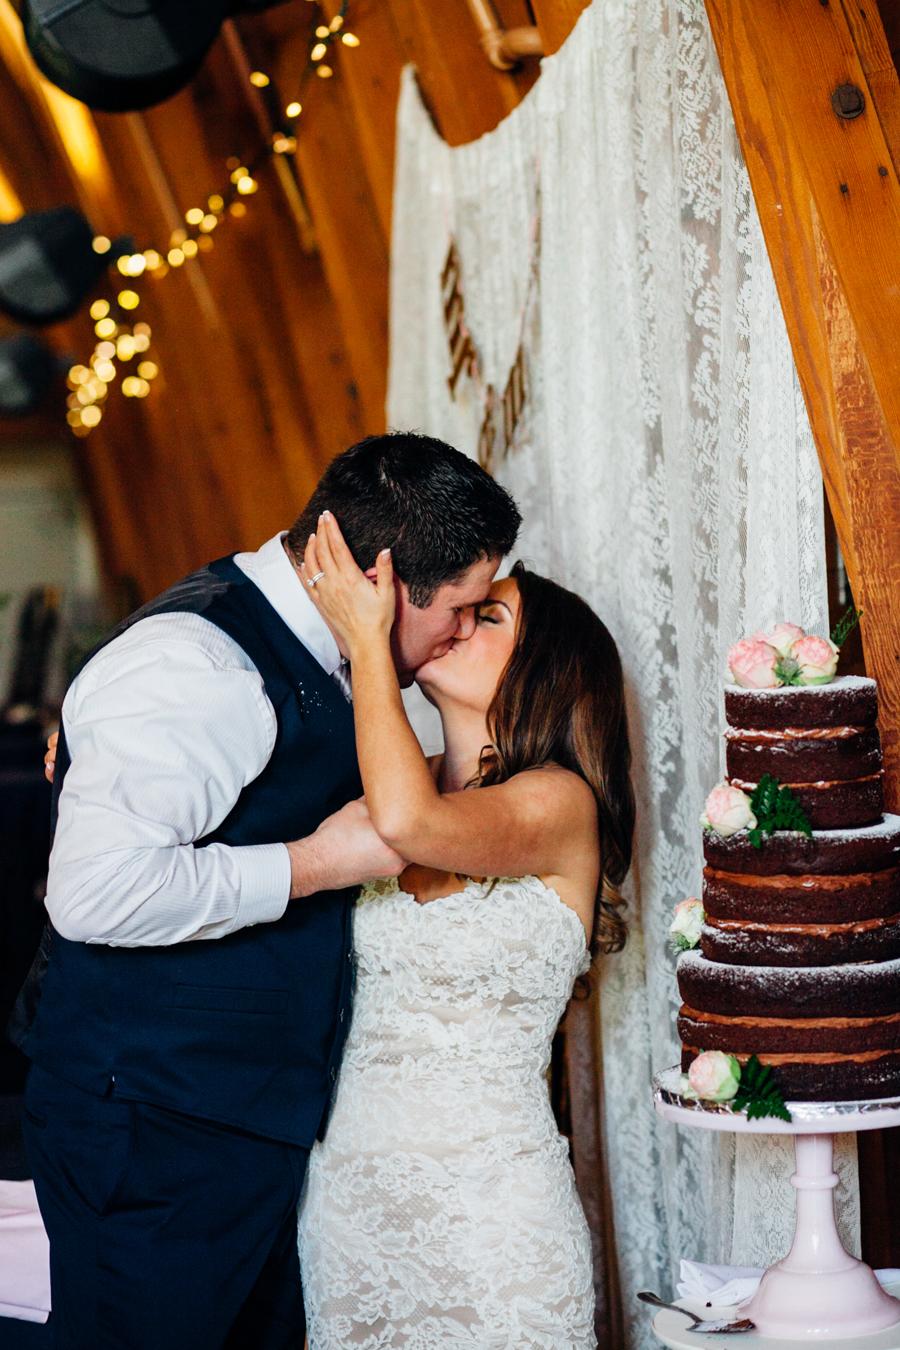 088-seattle-bothell-wedding-photographer-russells-restaurant-wilkins-photo.jpg